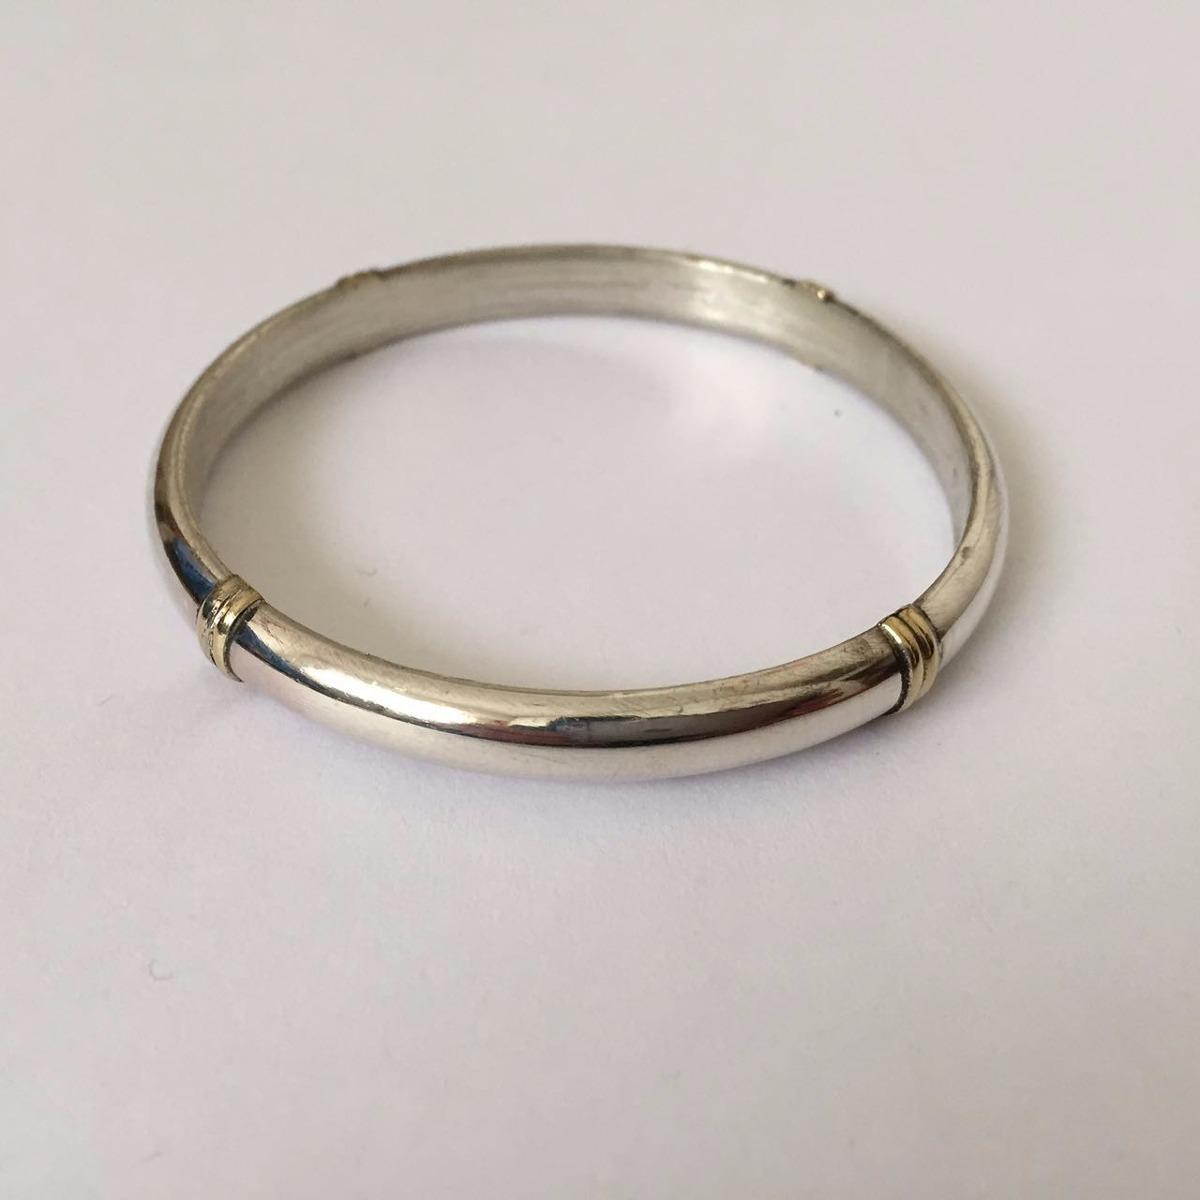 c8cf6c237cd1 esclava de plata 925 media caña hueca con oro 7mm   geh7co. Cargando zoom.